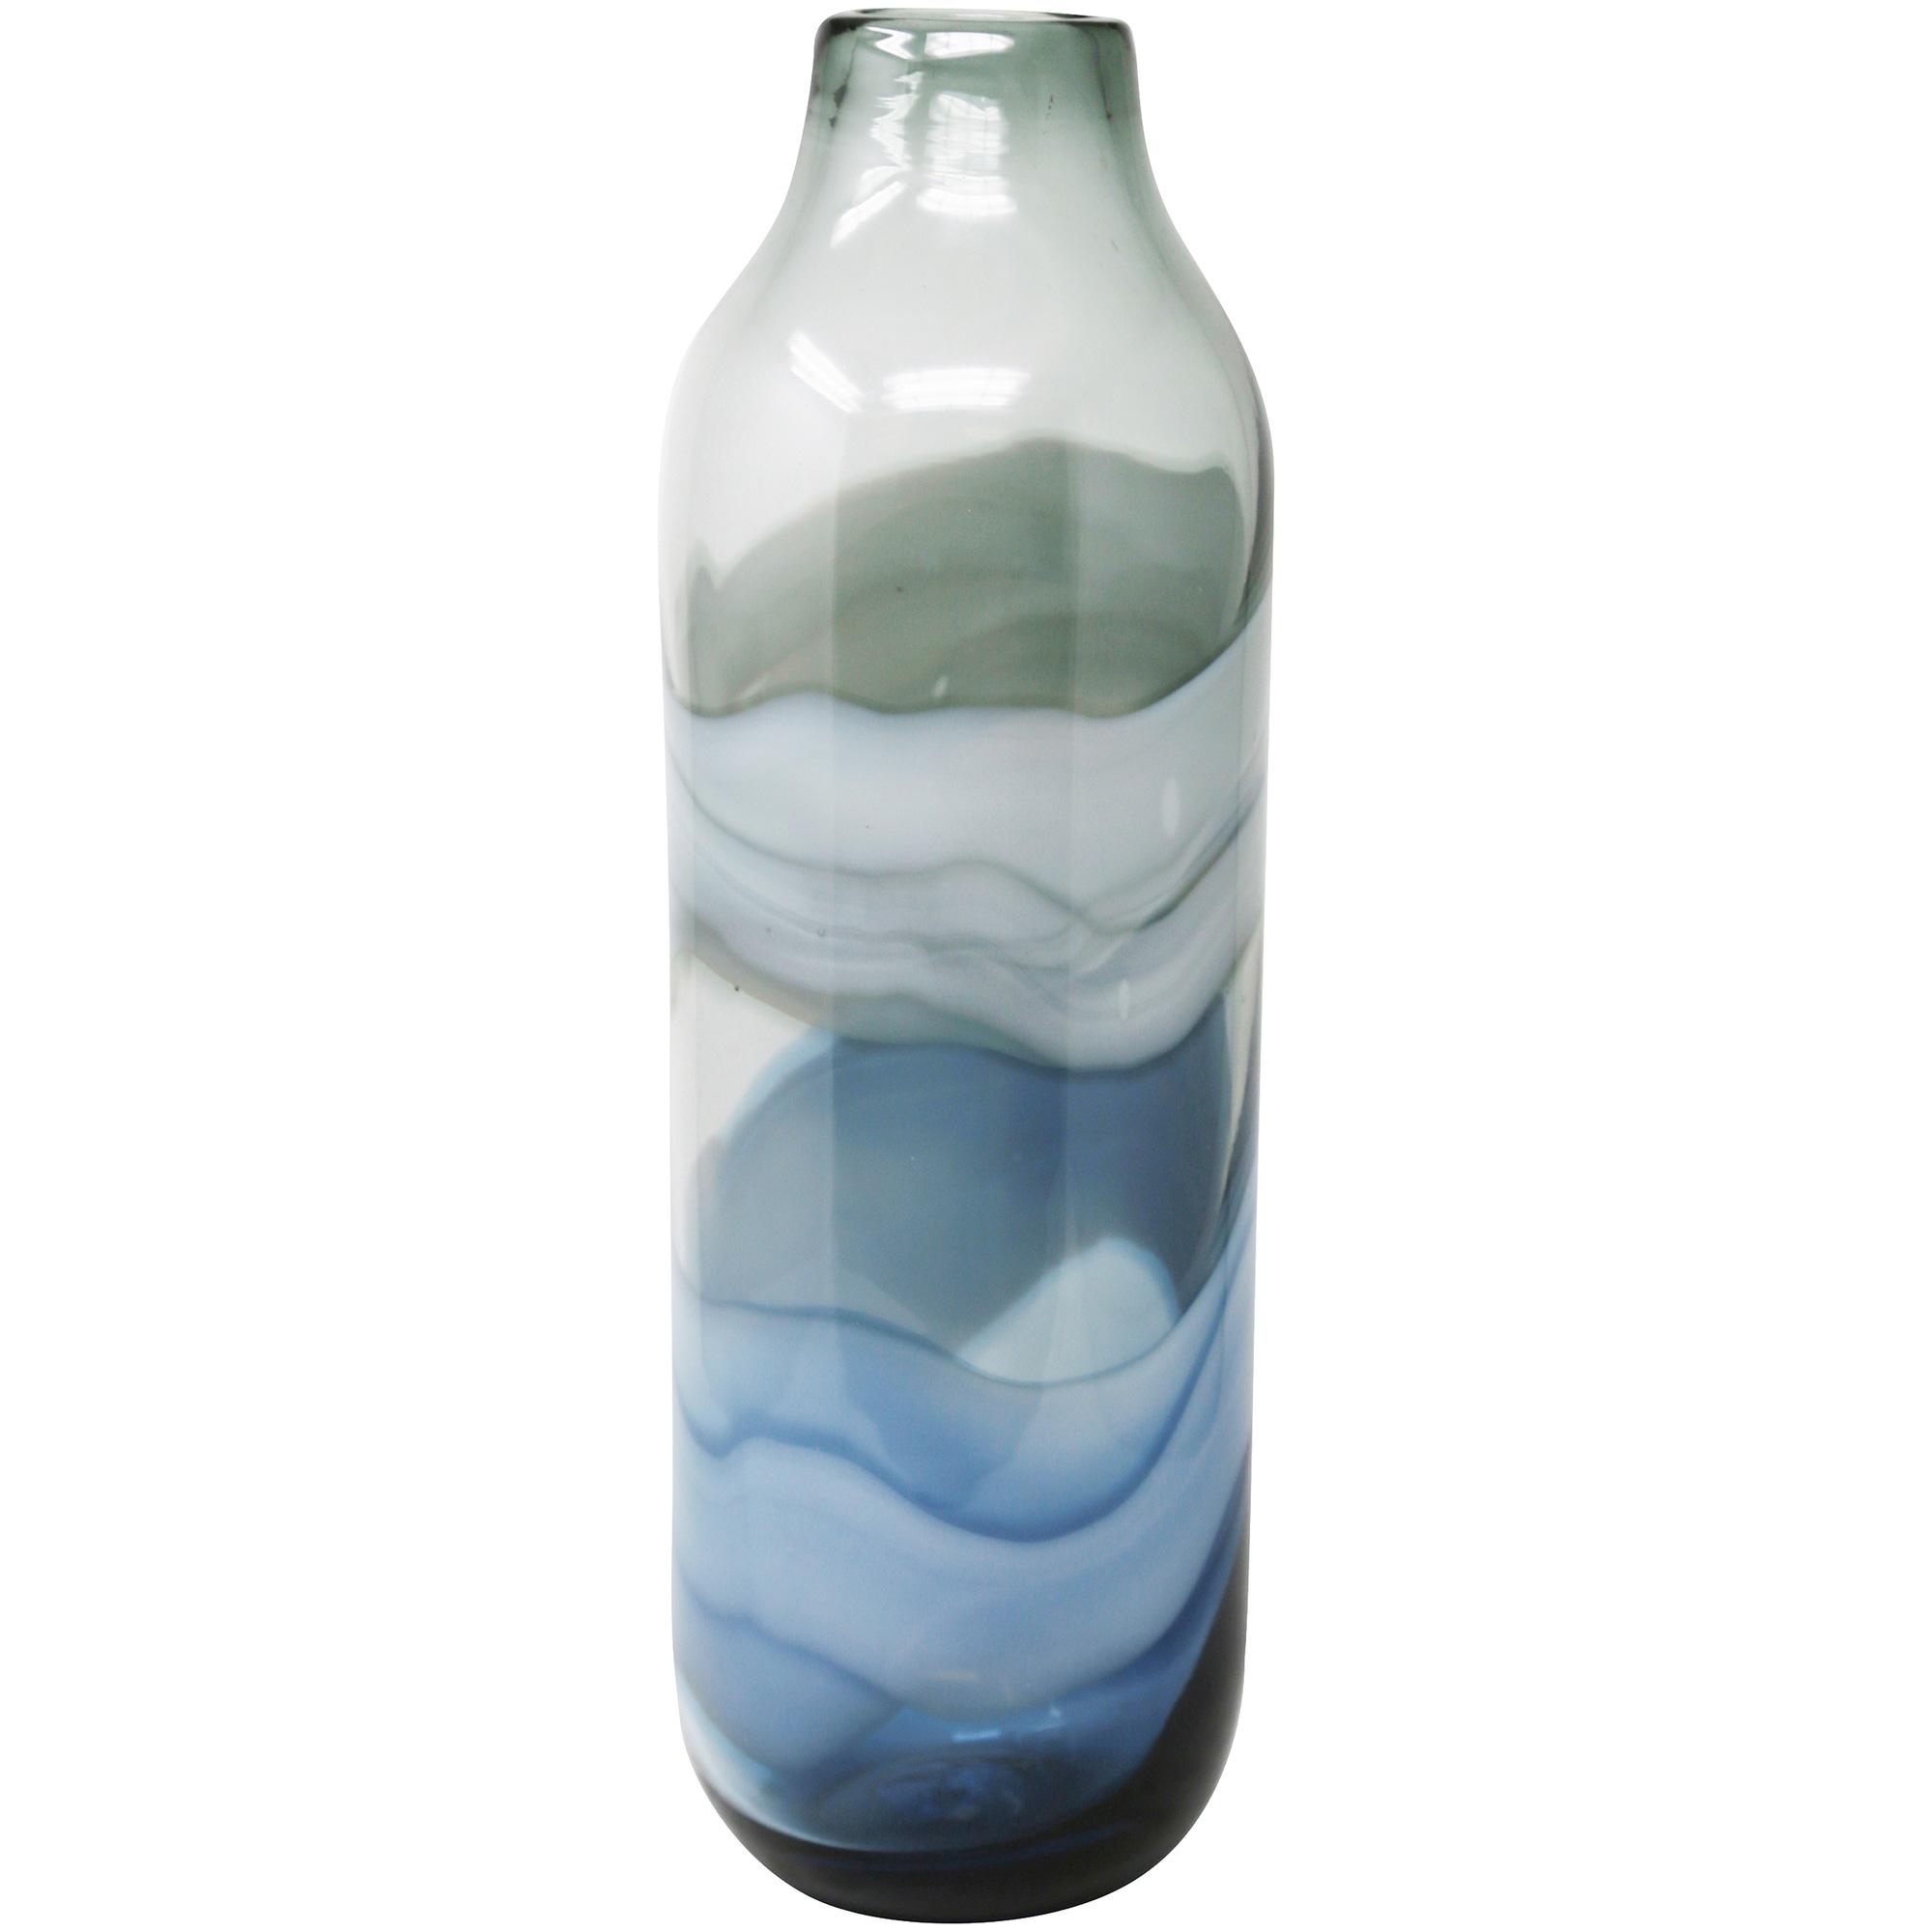 """Sagebrook | Elevated Chic 18"""" Glass Vase"""